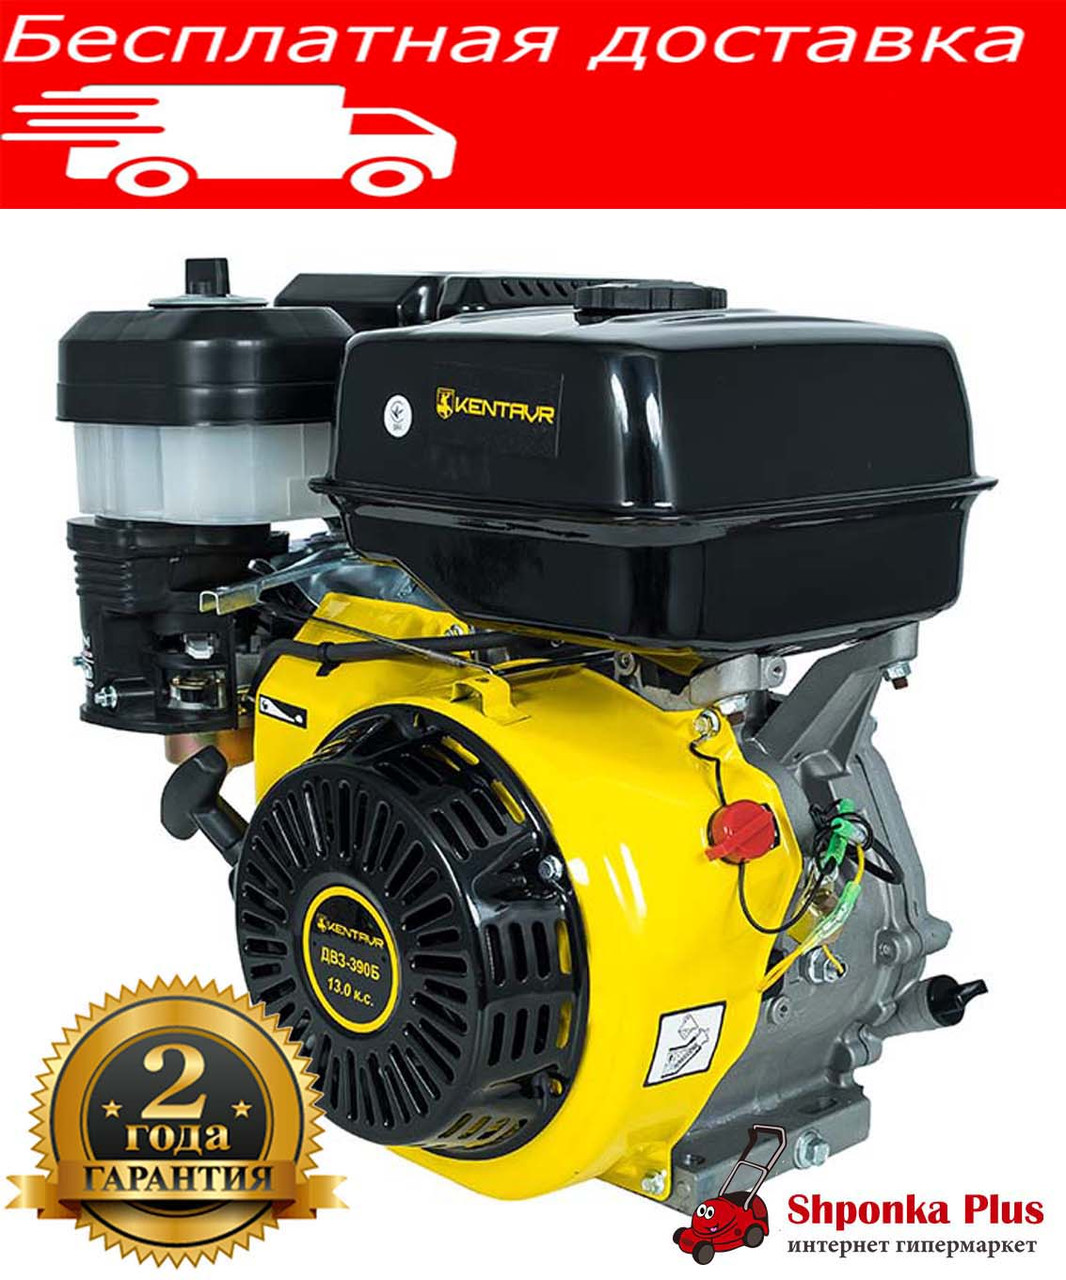 Двигатель бензиновый 13 л.с. шпонка Кентавр ДВЗ-390Б